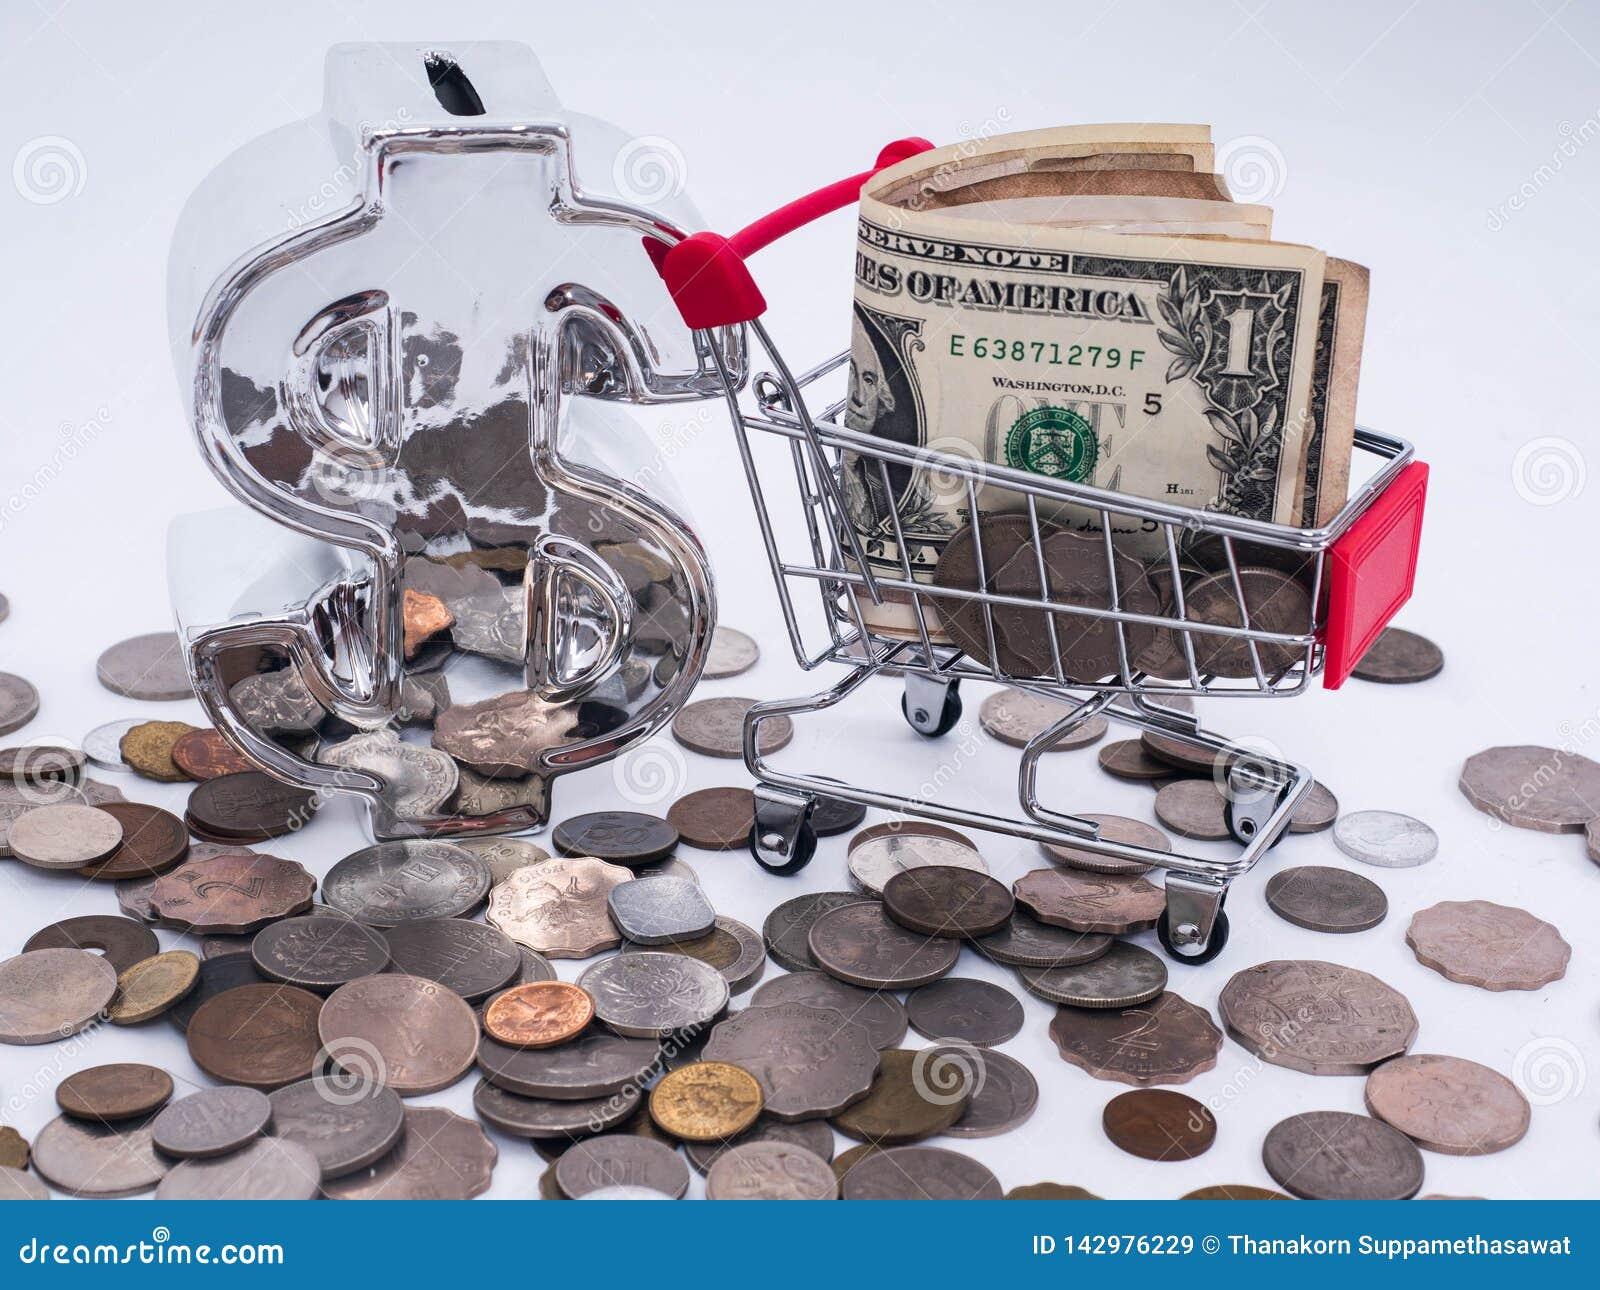 online coin exchange